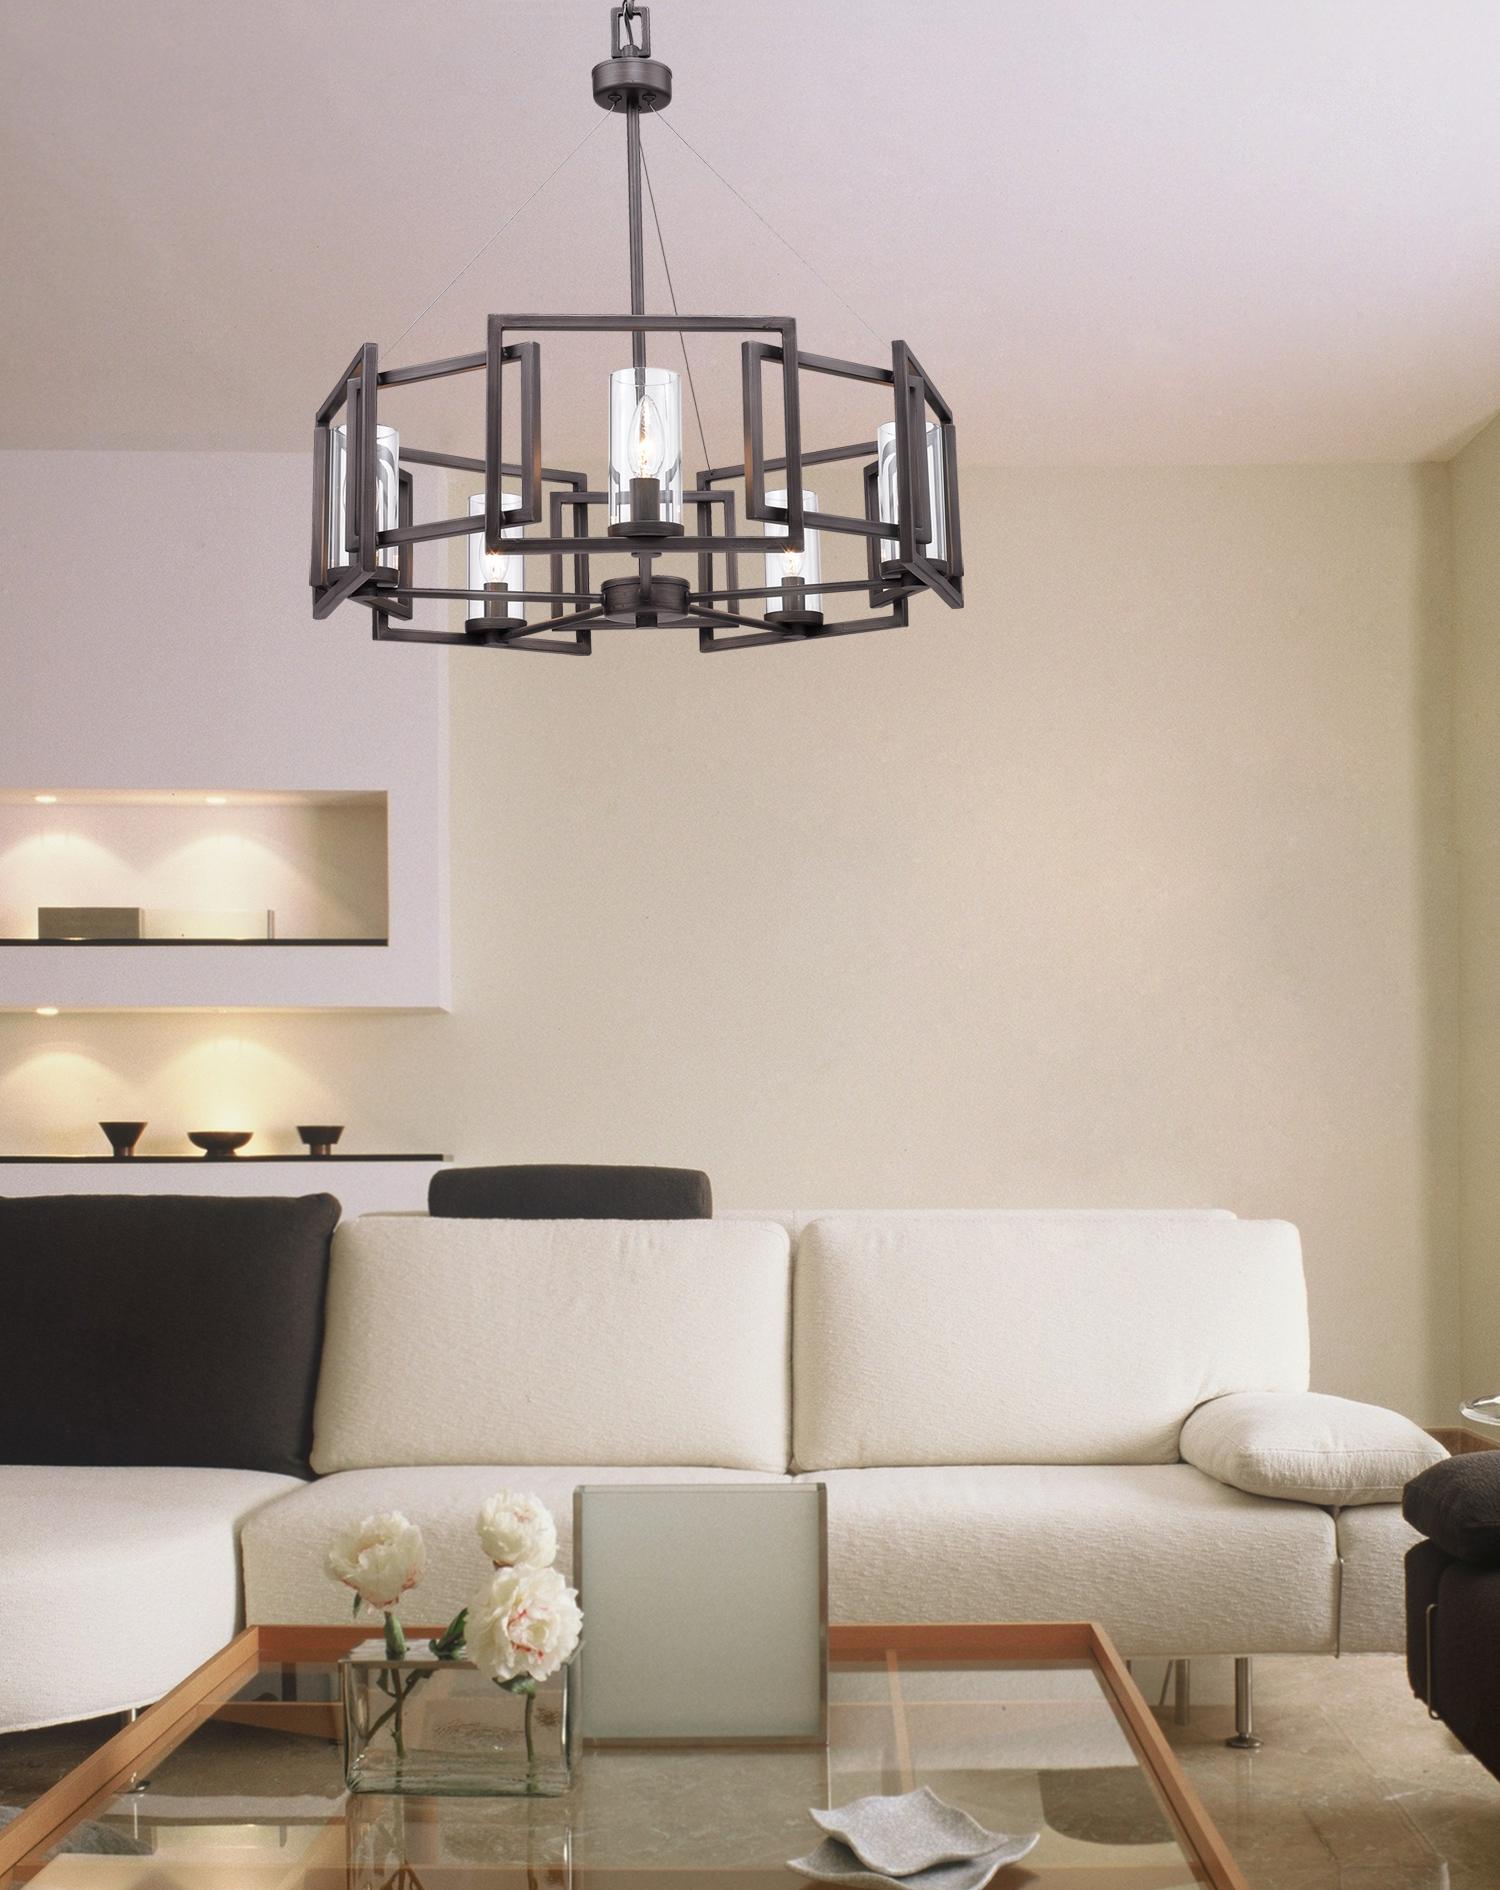 avant lighting. Golden Lighting Marco: Looking For Cool Contemporary That Isn\u0027t Too Avant- Avant